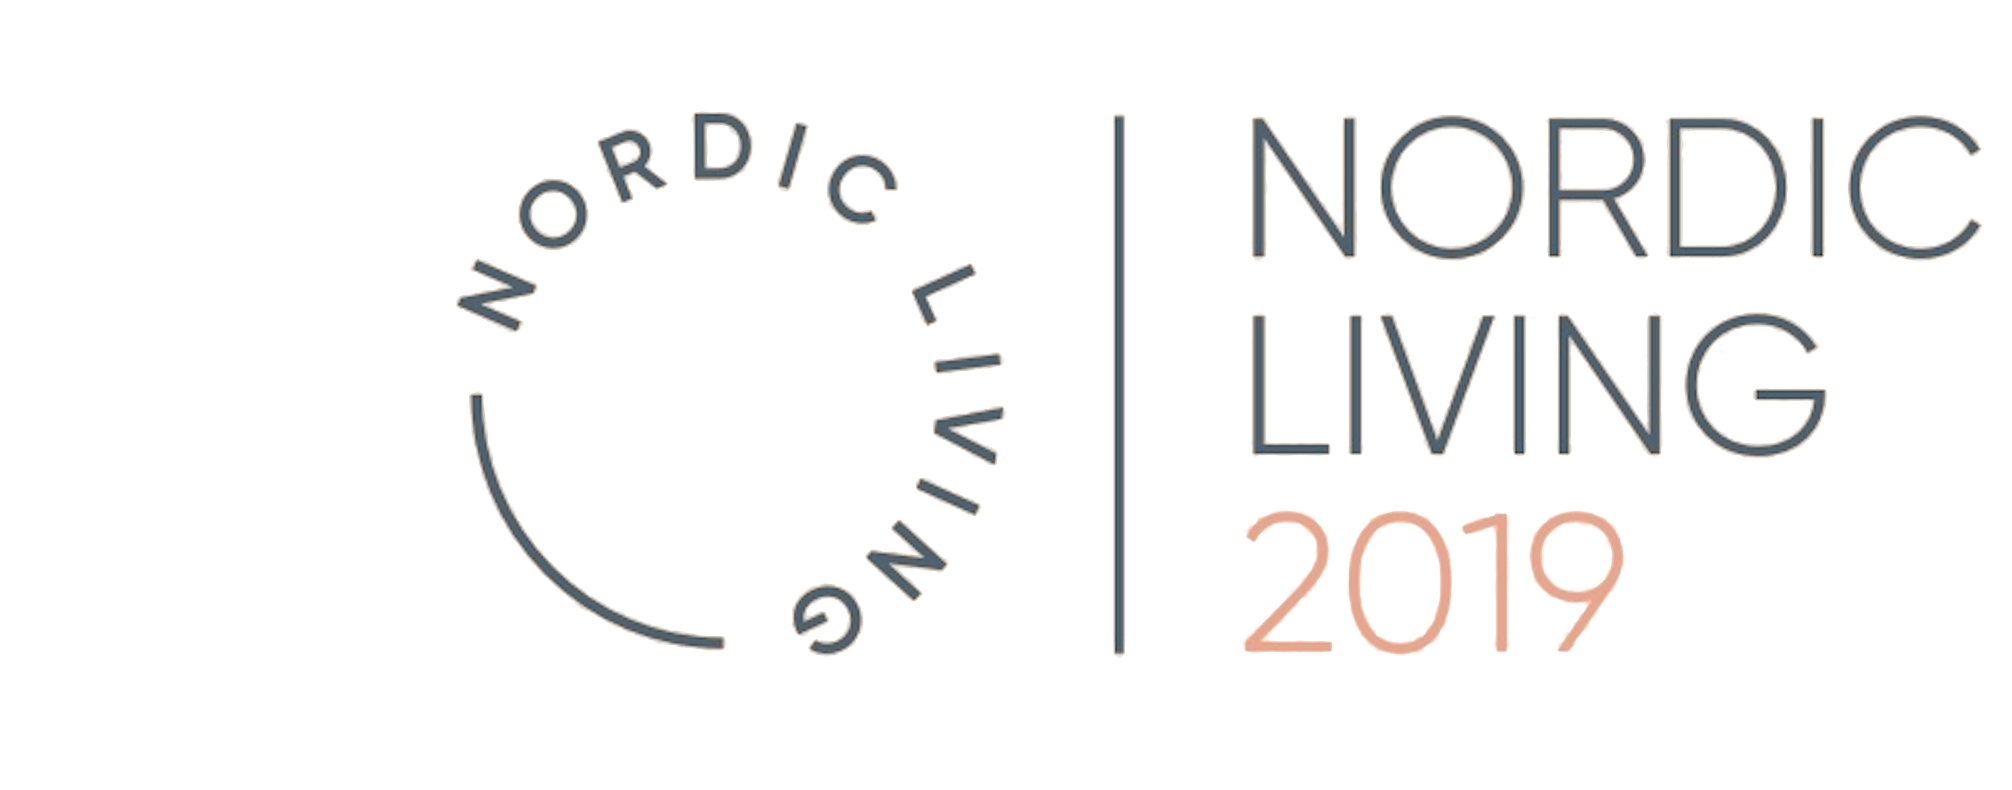 NORDIC LIVING logo